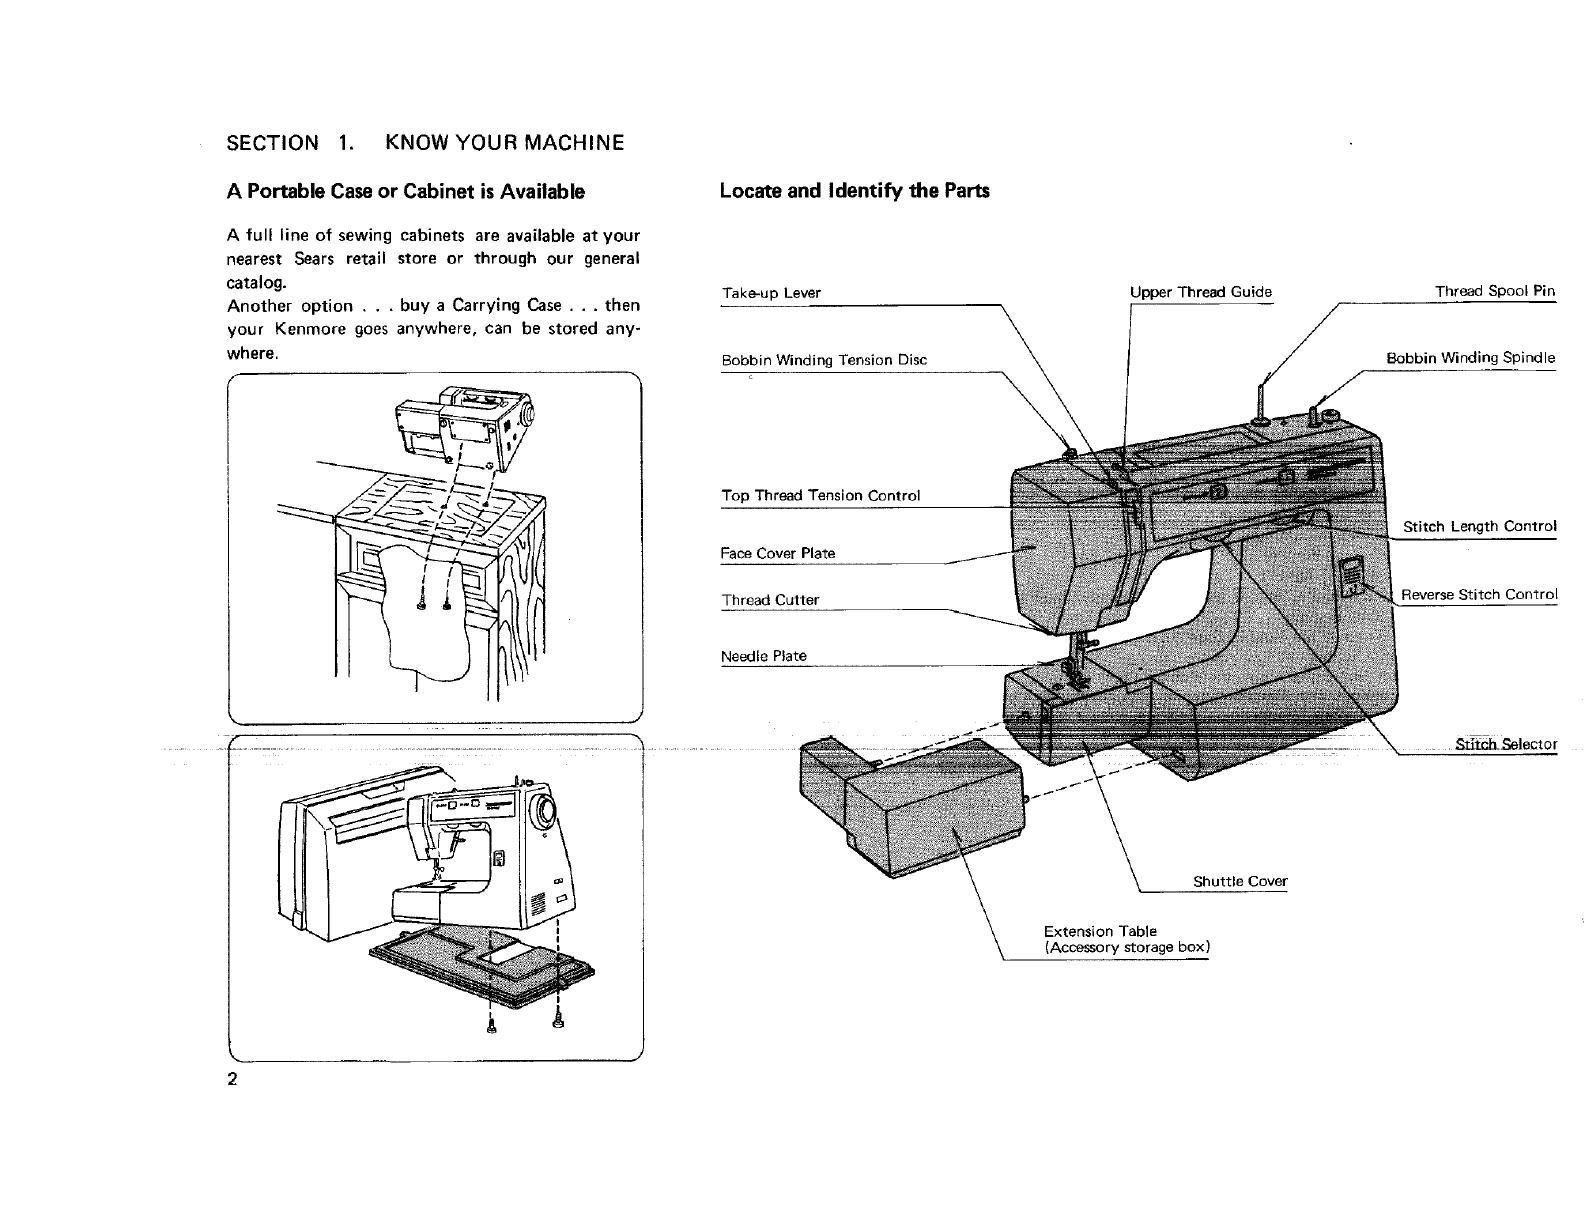 Kenmore 3851278180 User Manual SEWING MACHINE Manuals And